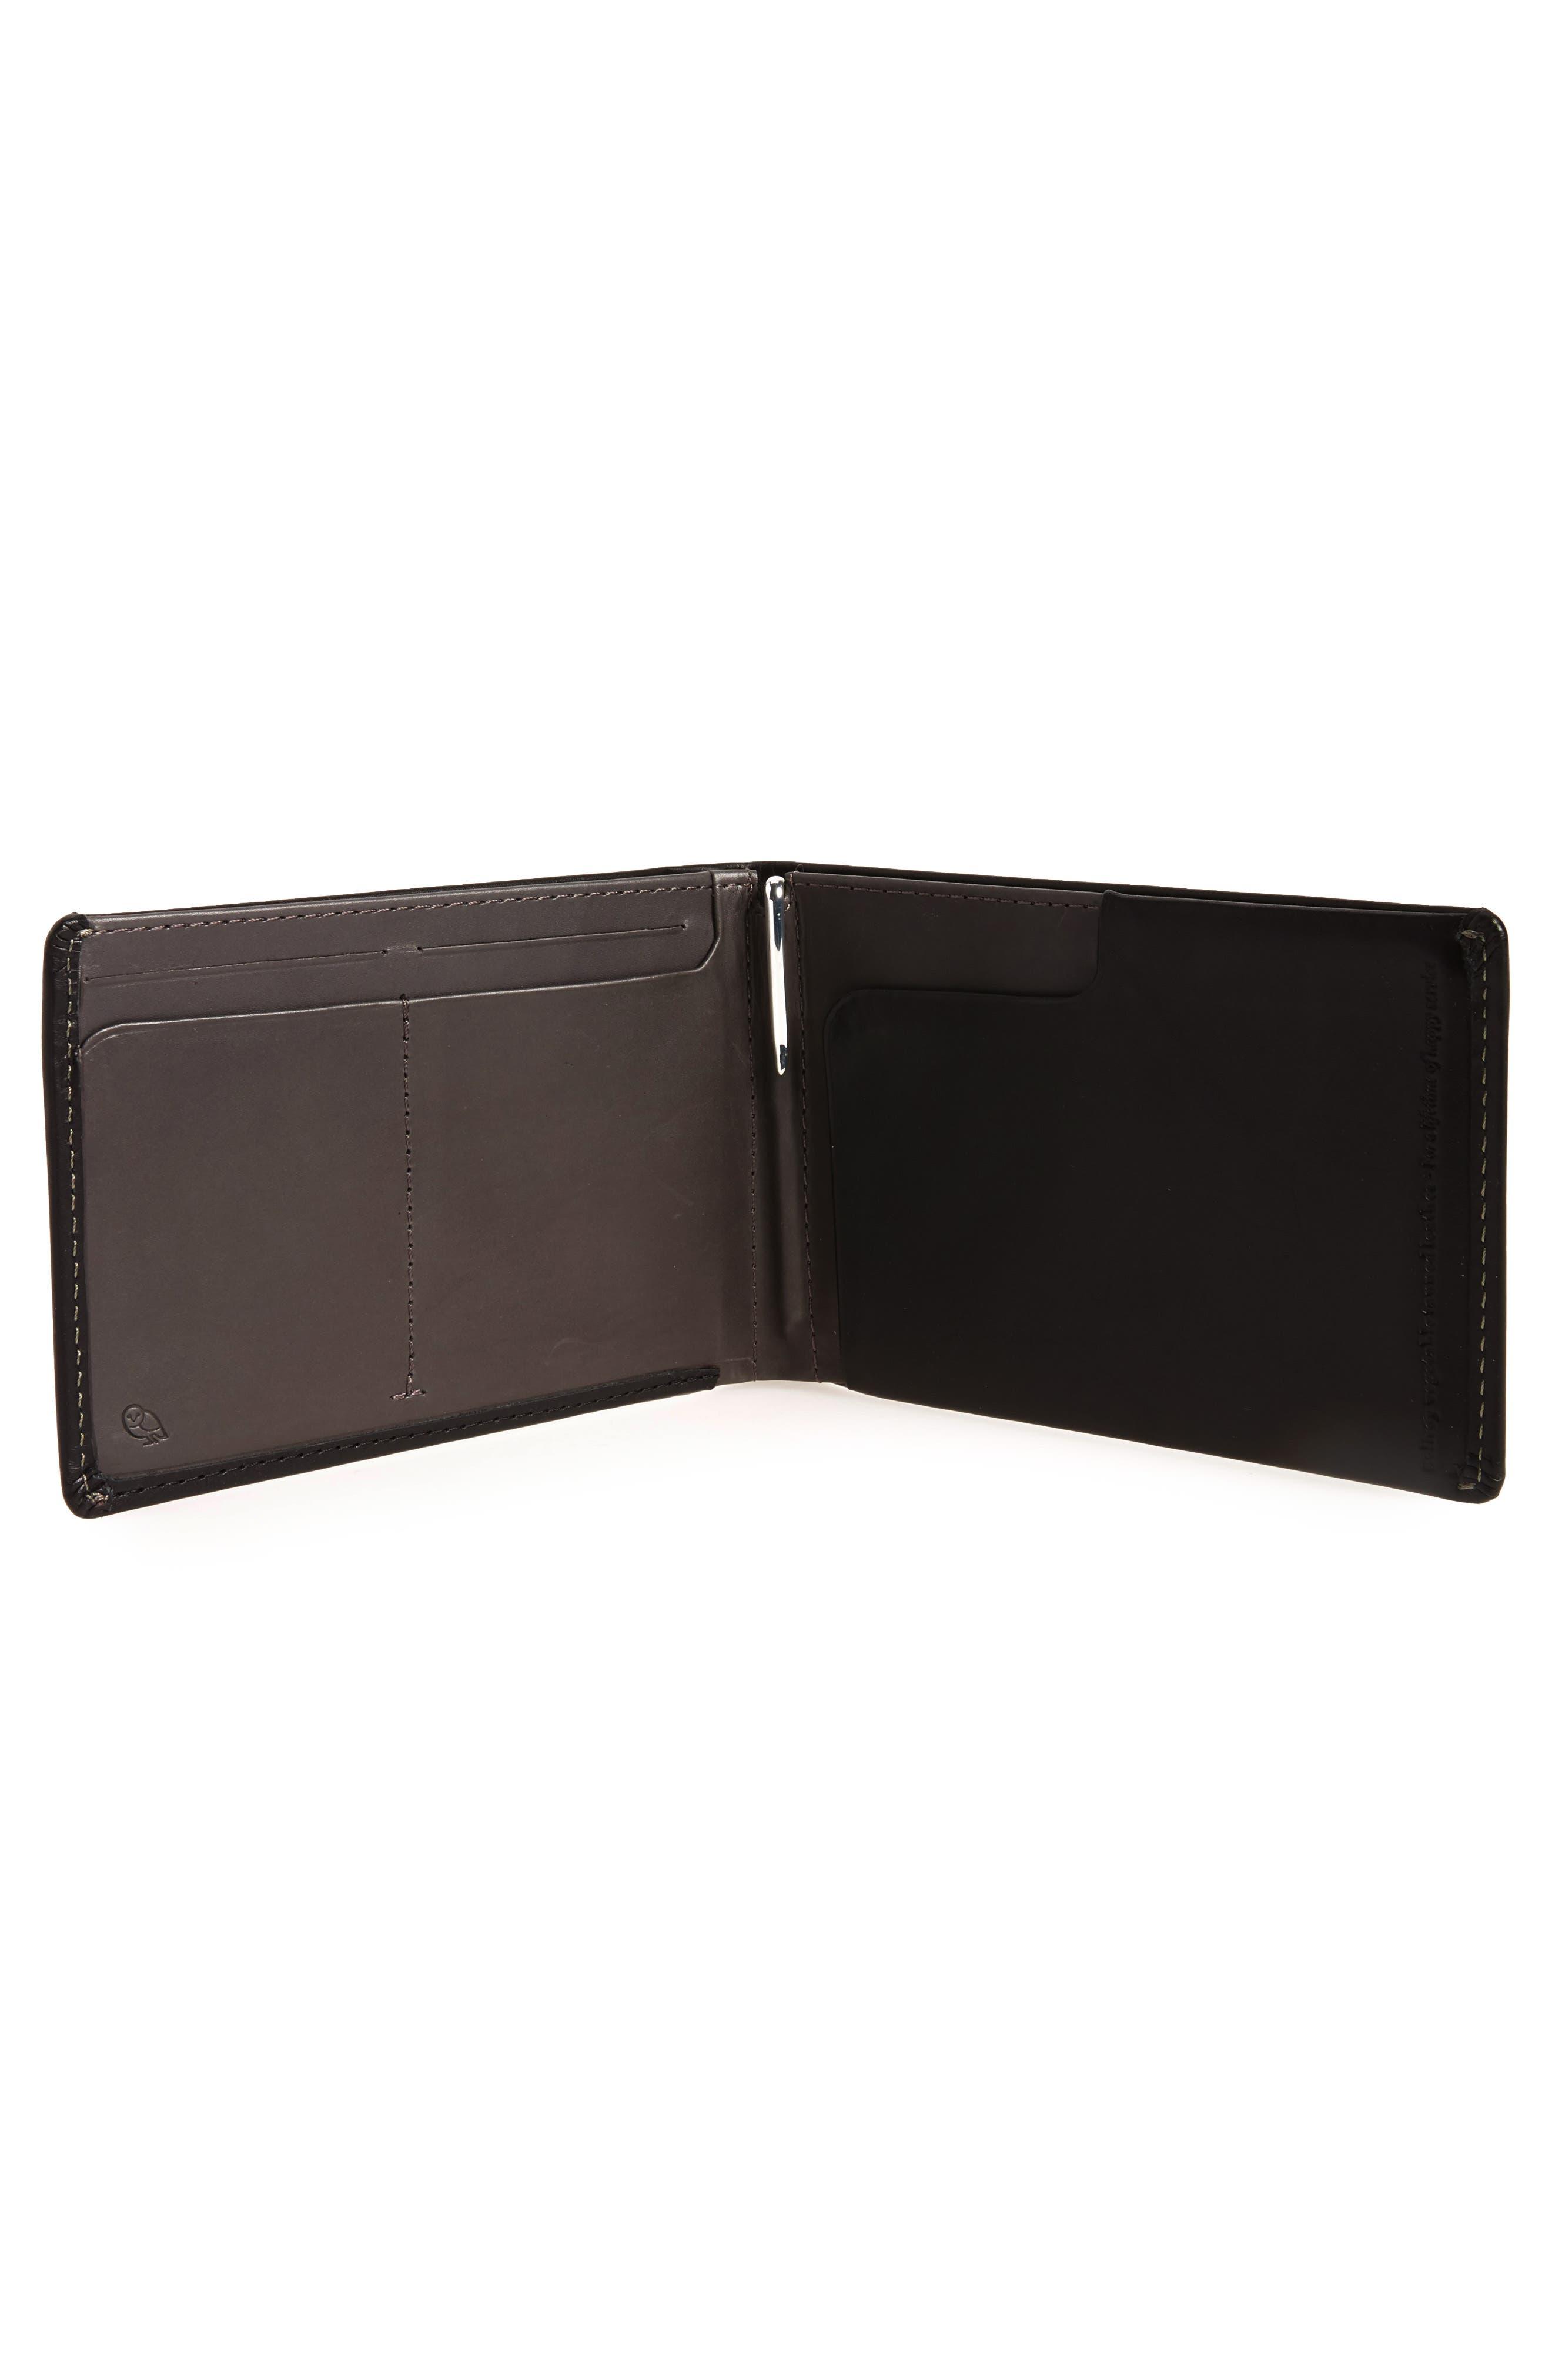 RFID Travel Wallet,                             Alternate thumbnail 2, color,                             Black